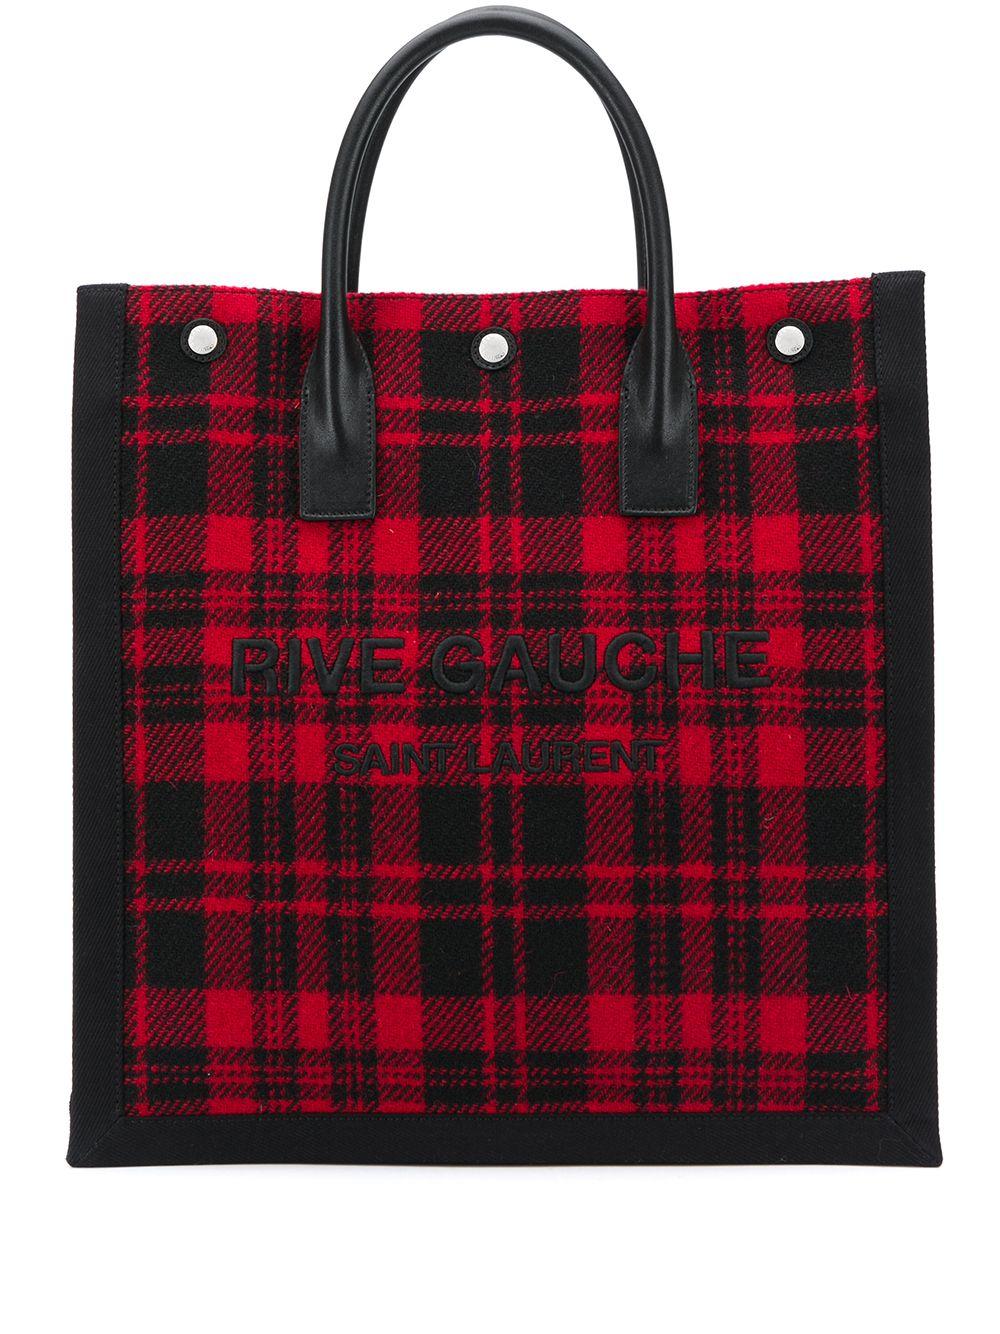 Rive Gauche Shopping Bag